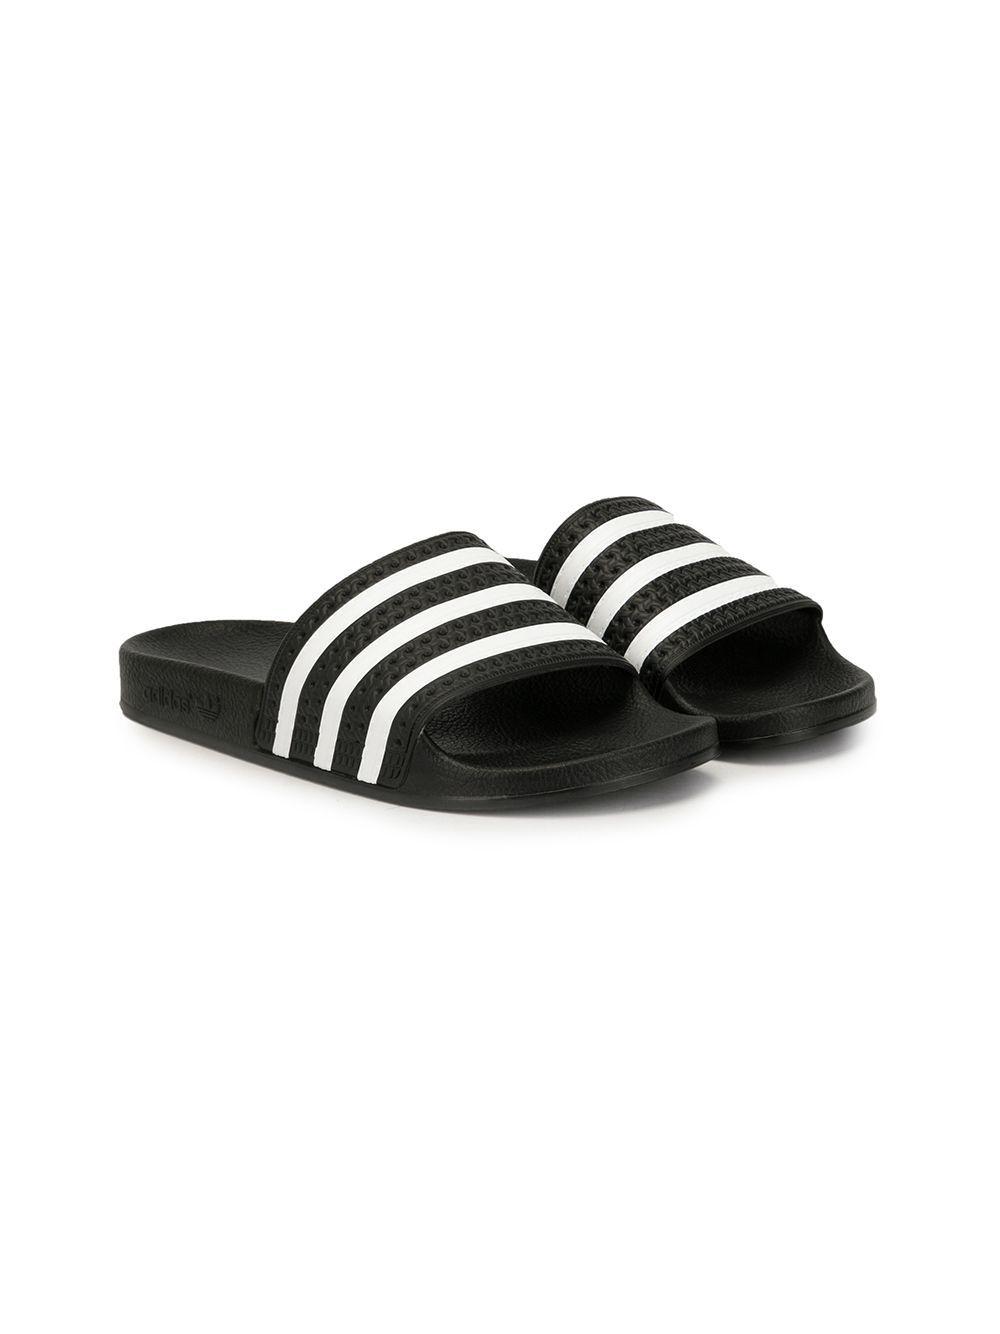 adidas - adilette Slides - vozeli.com